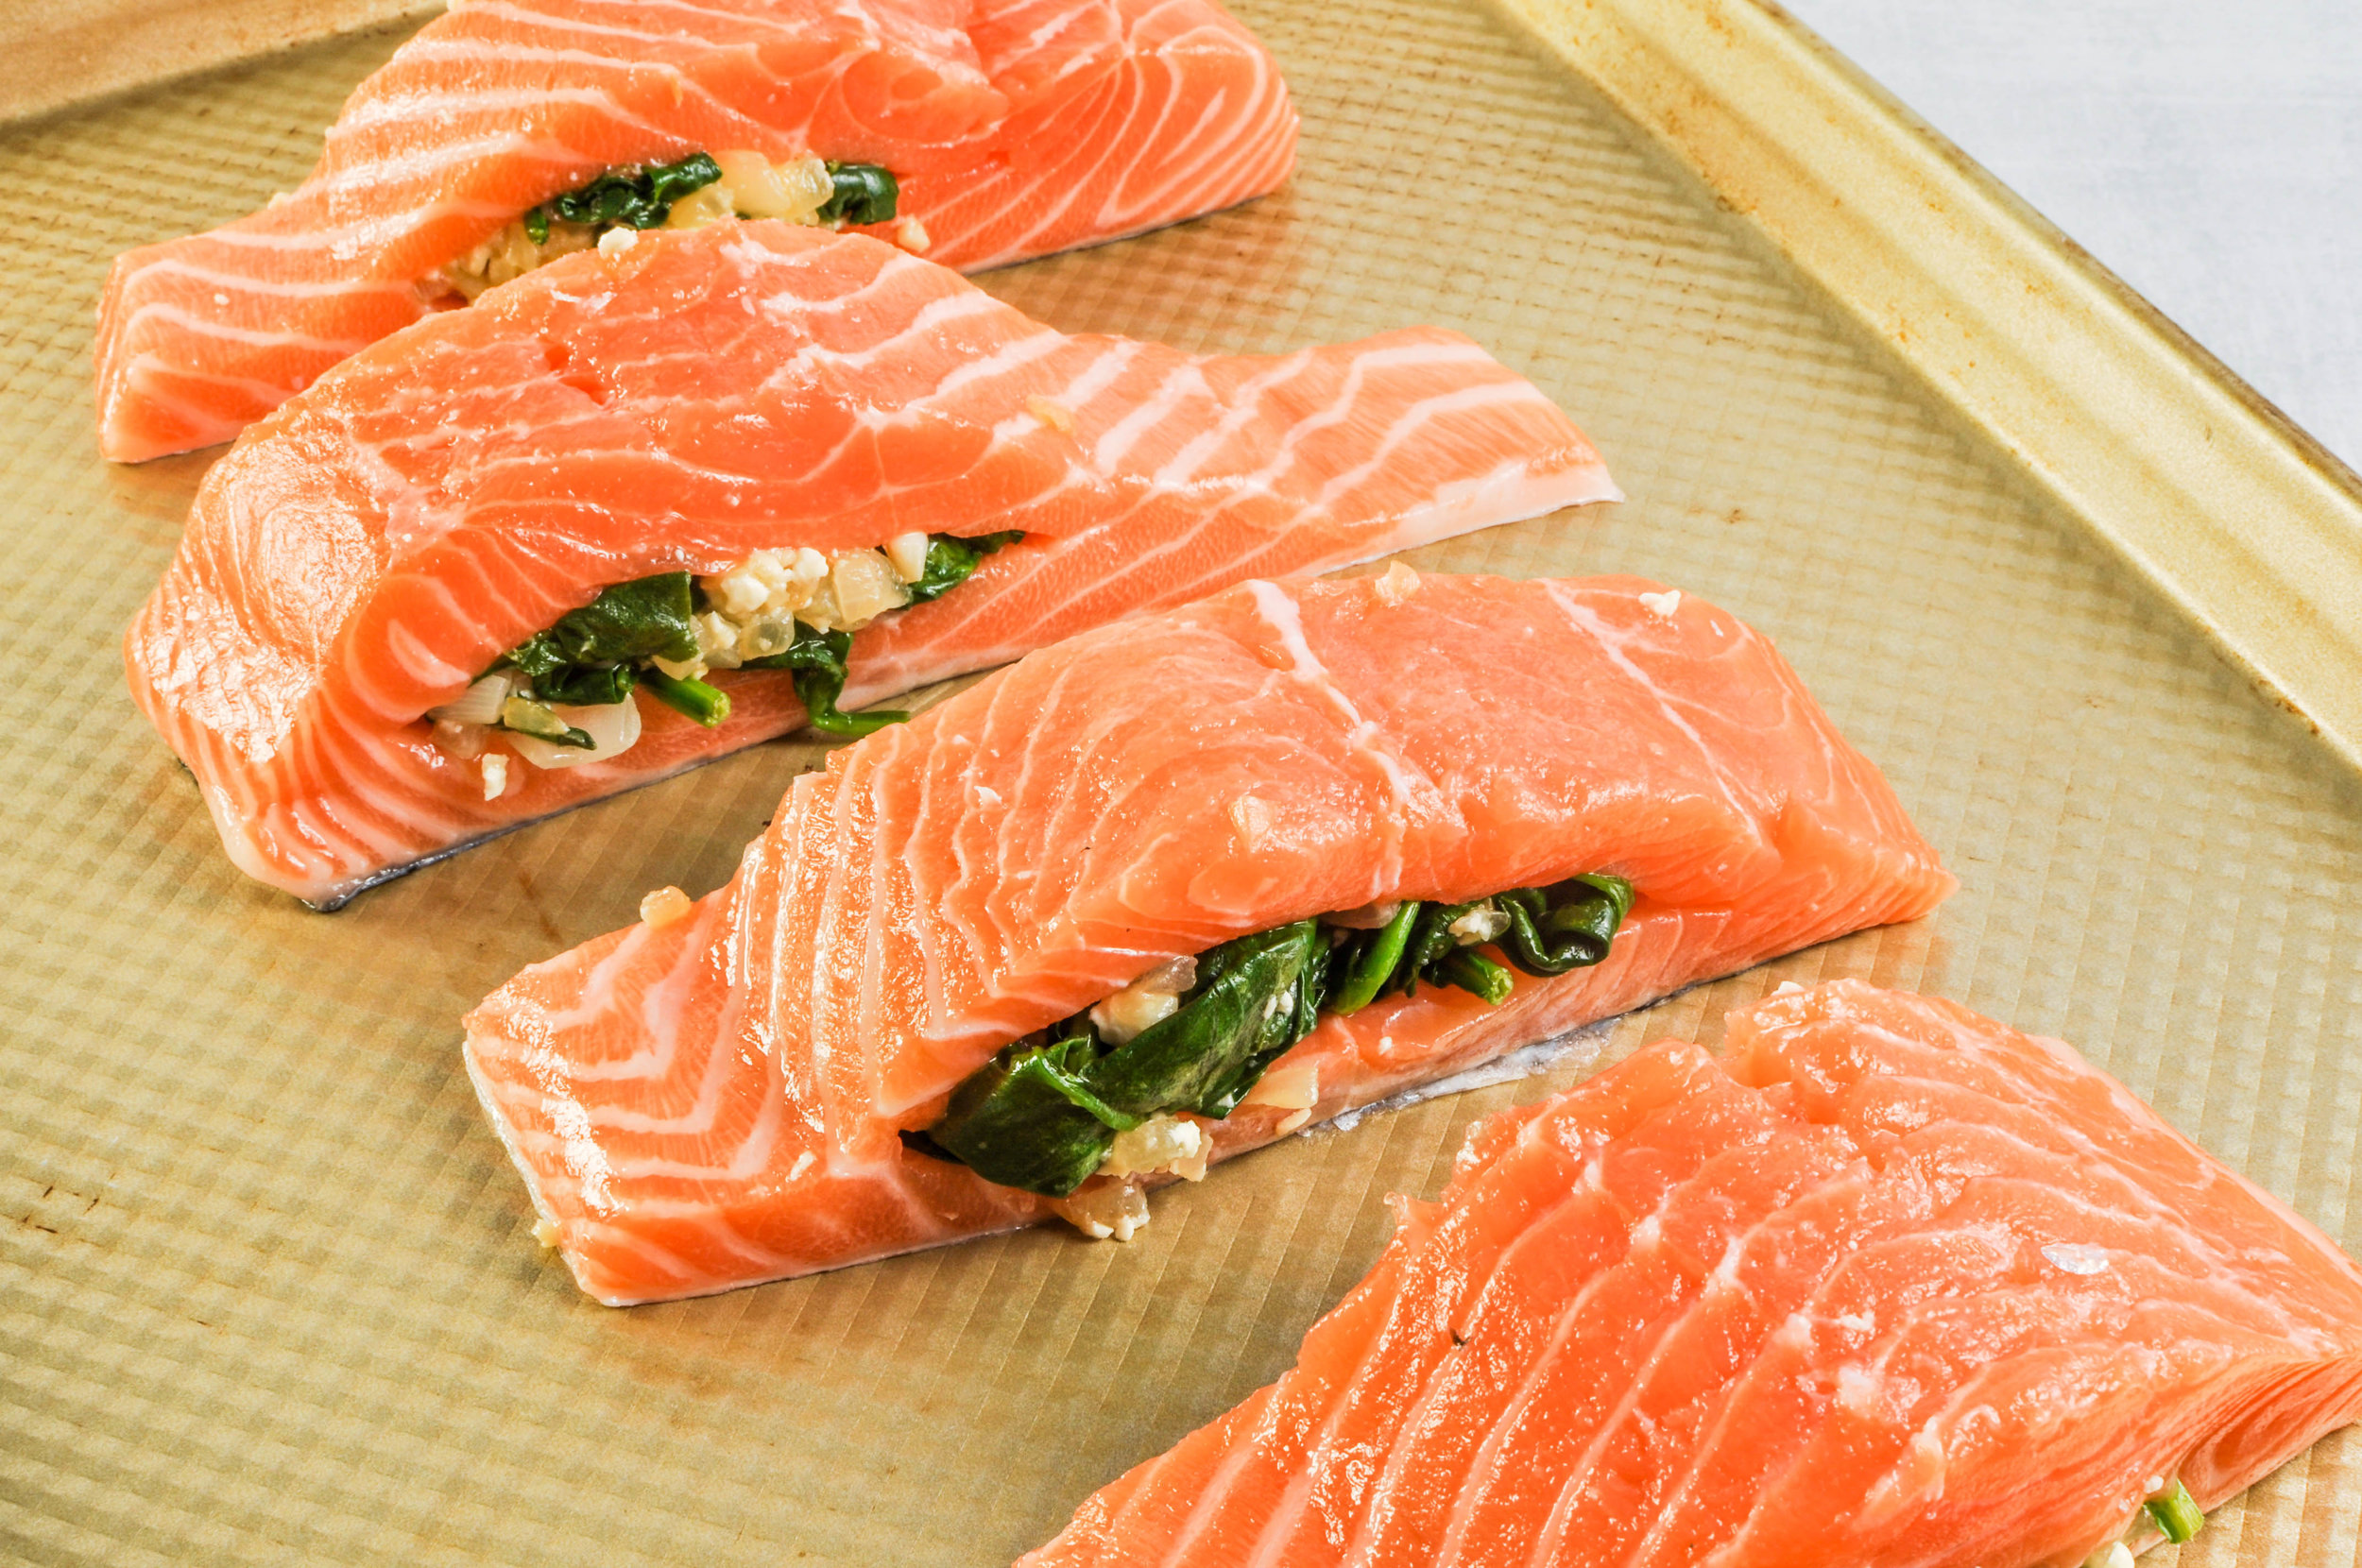 Spinach & Feta Stuffed Salmon